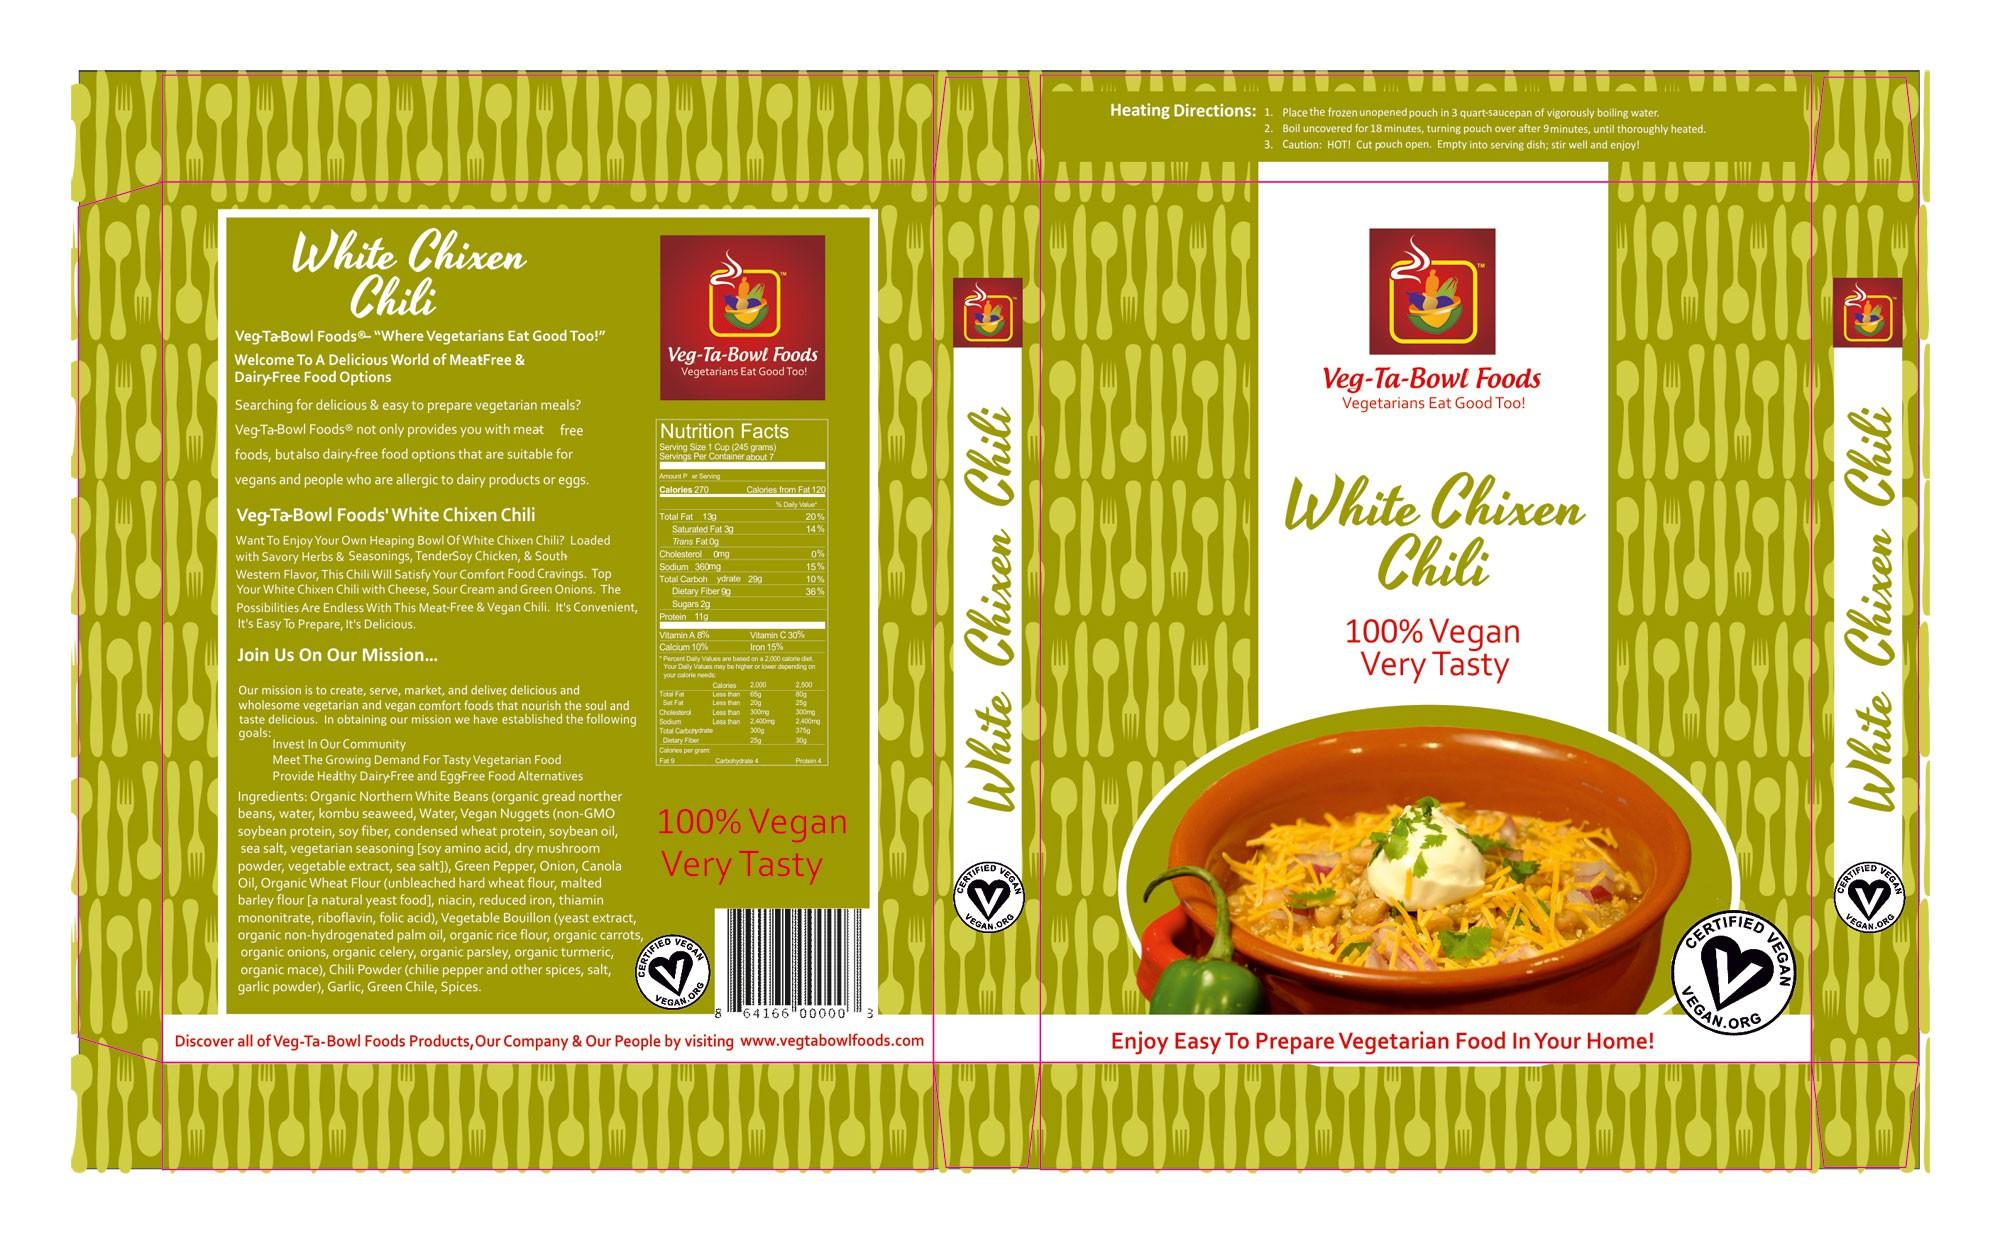 Create Consumer Grabbing Packaging for Brand Spanking New Vegetarian & Vegan Food Products